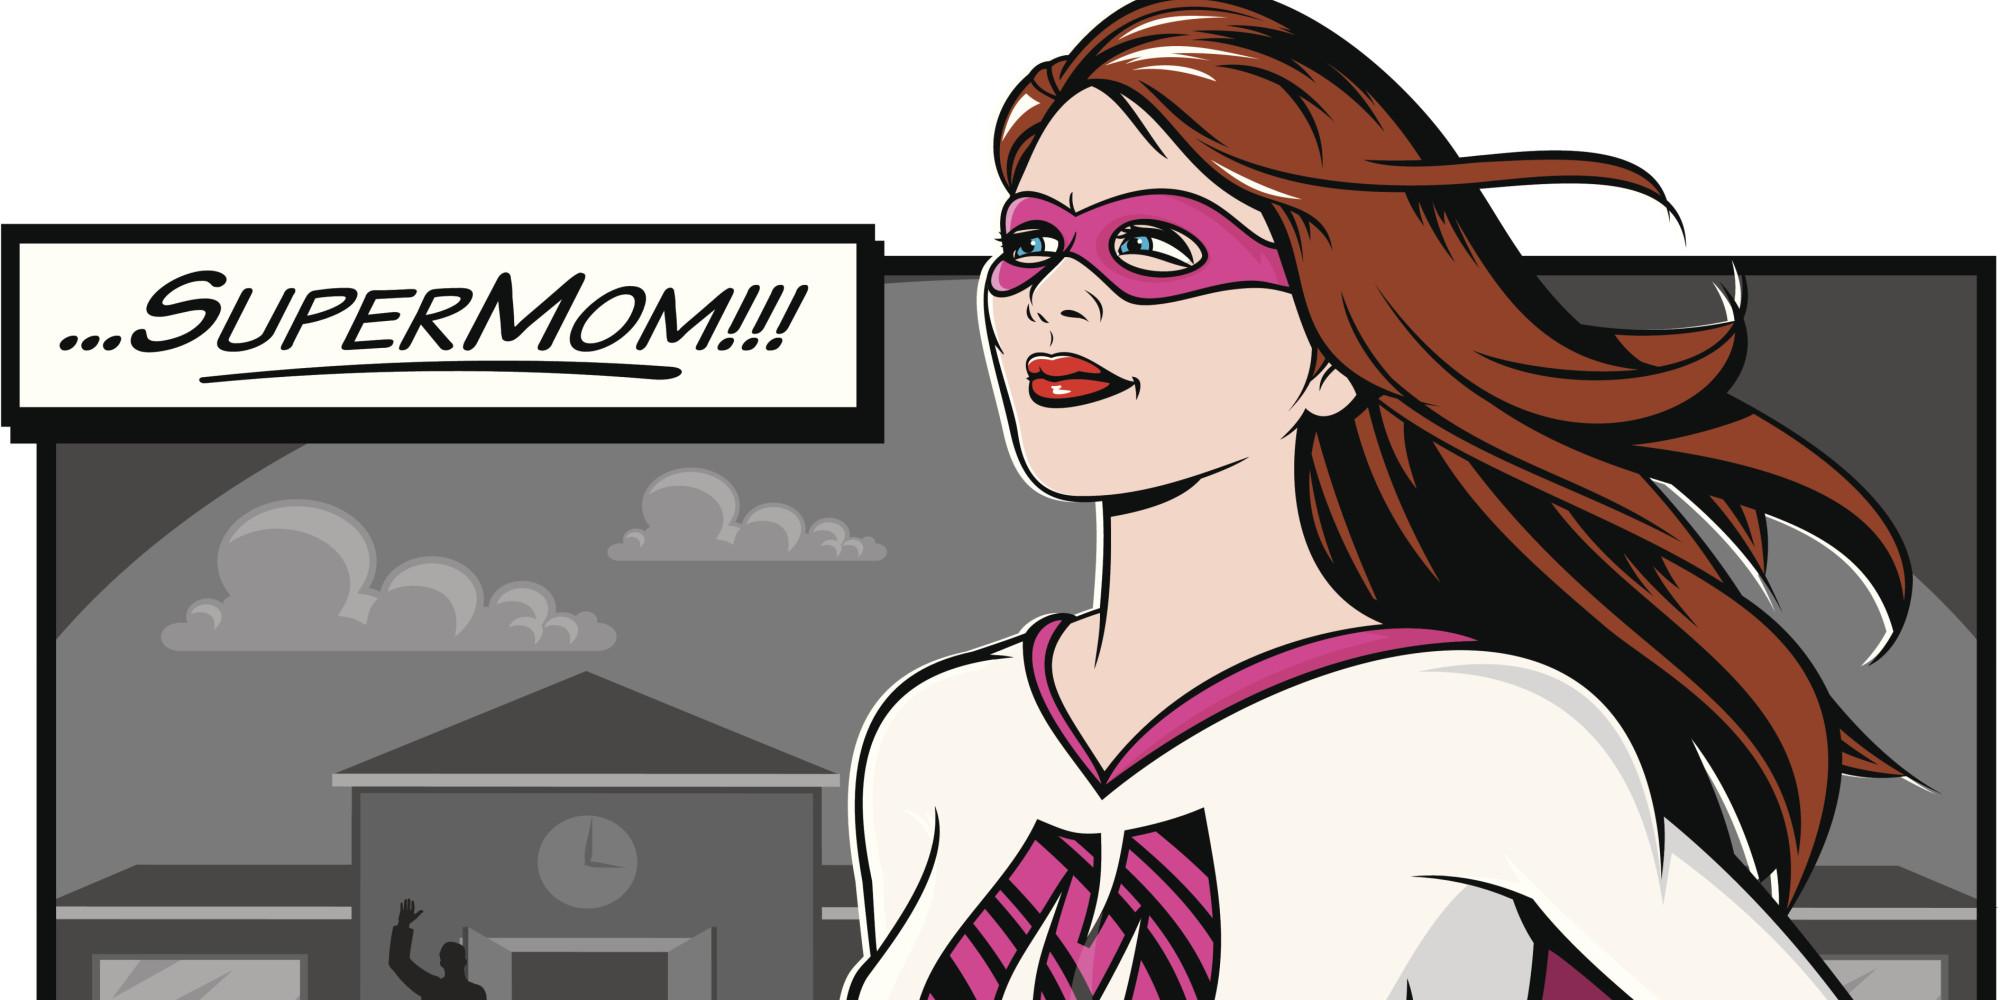 o-ADULT-WOMAN-SUPERHERO-COSTUME-facebook